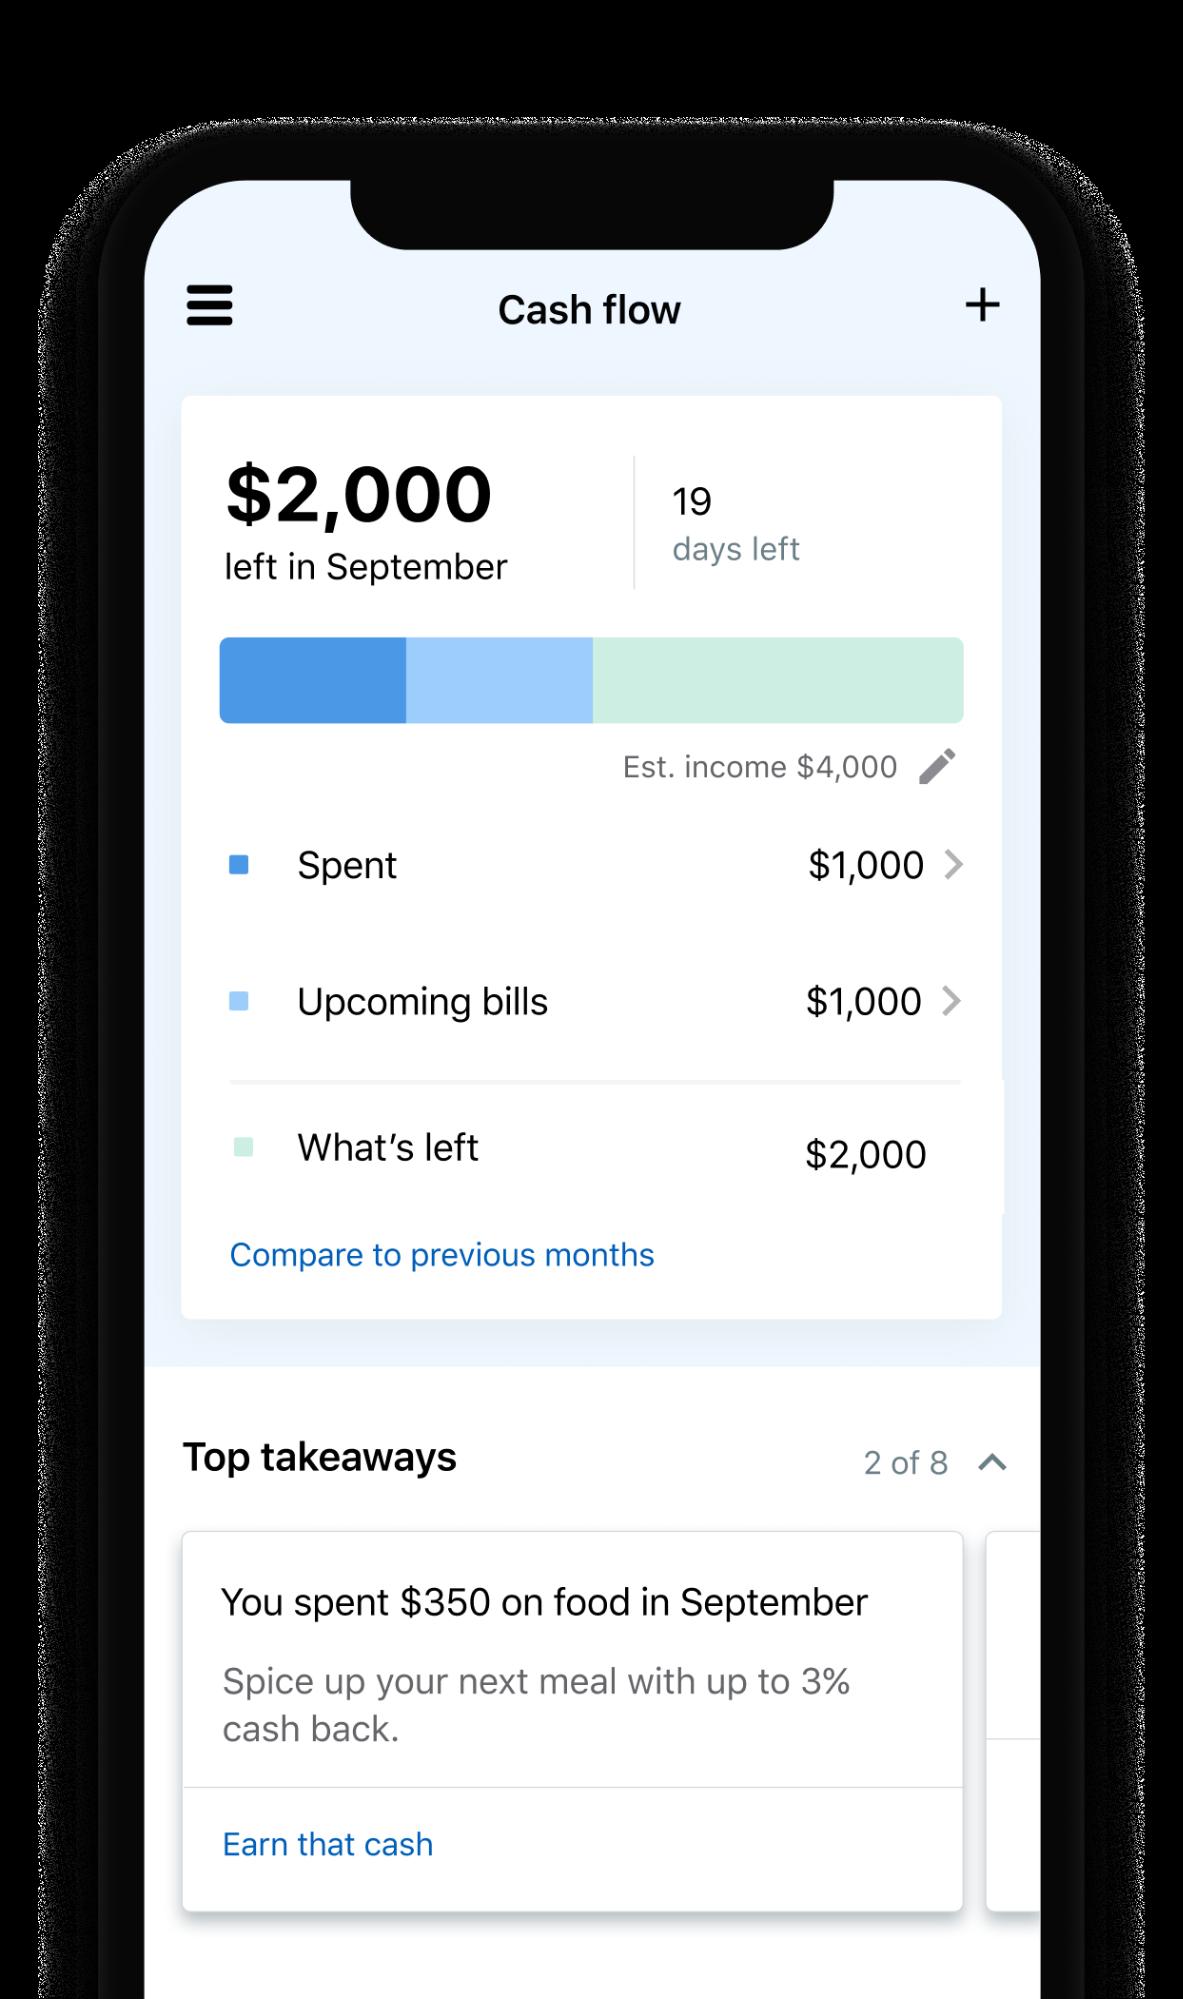 NerdWallet Cash Flow Tab